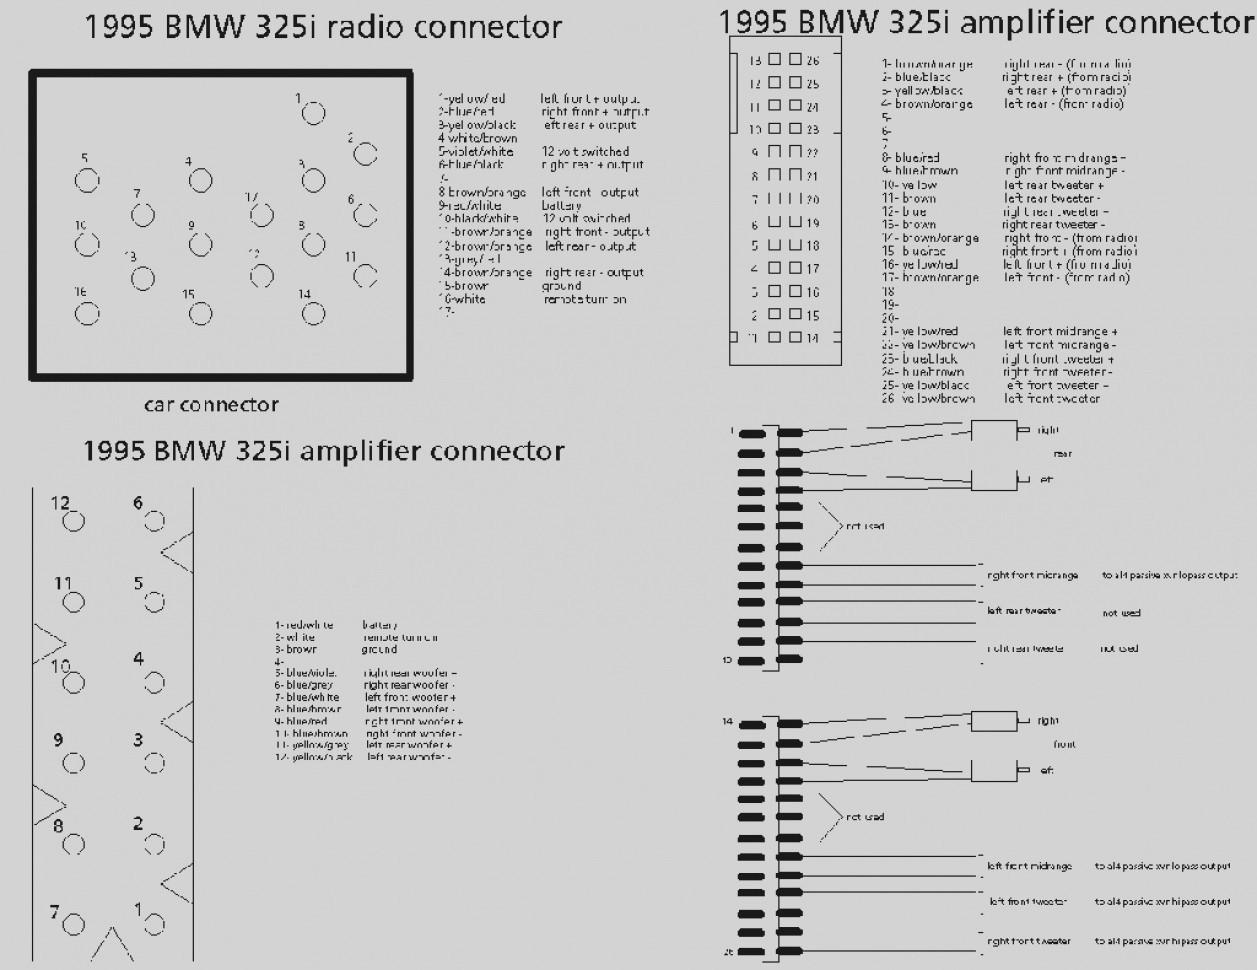 E39 Radio Wiring - General Wiring Diagrams 181.ku.tarnopolski.de